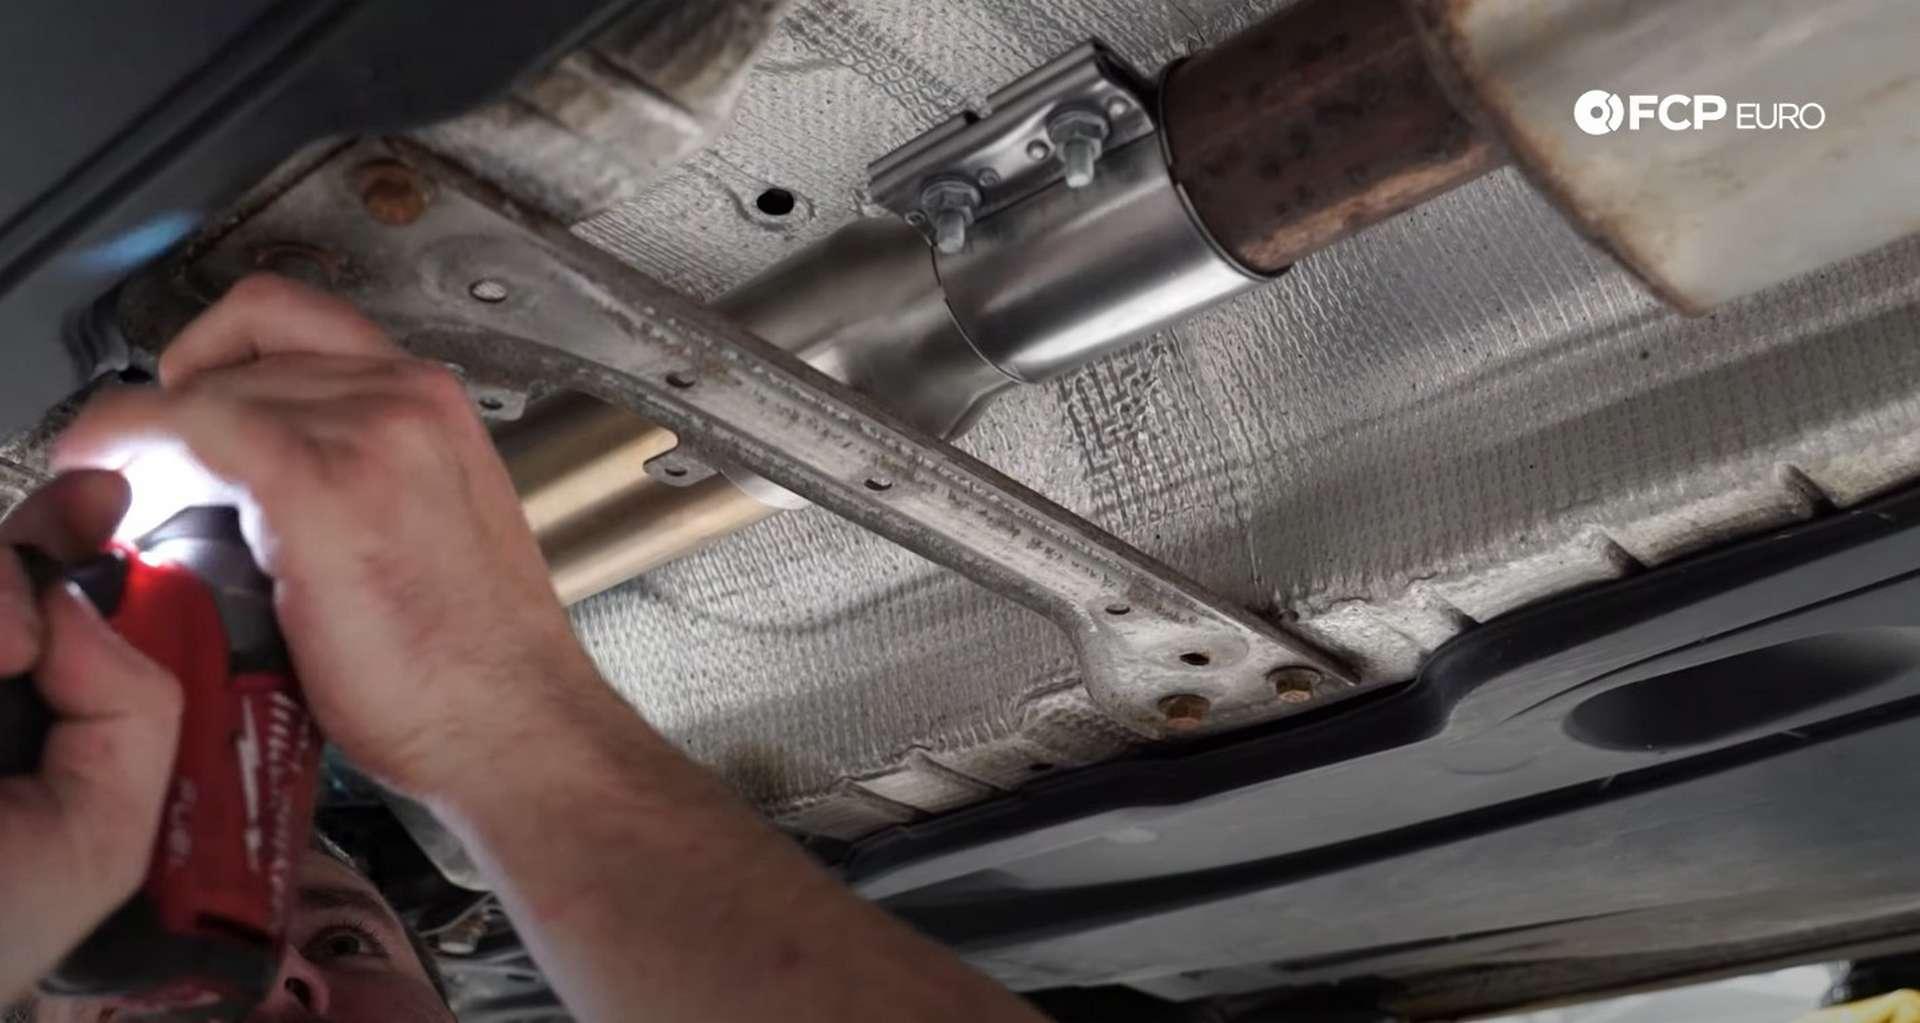 DIY MK7 VW GTI Turbocharger Upgrade refitting the chassis brace